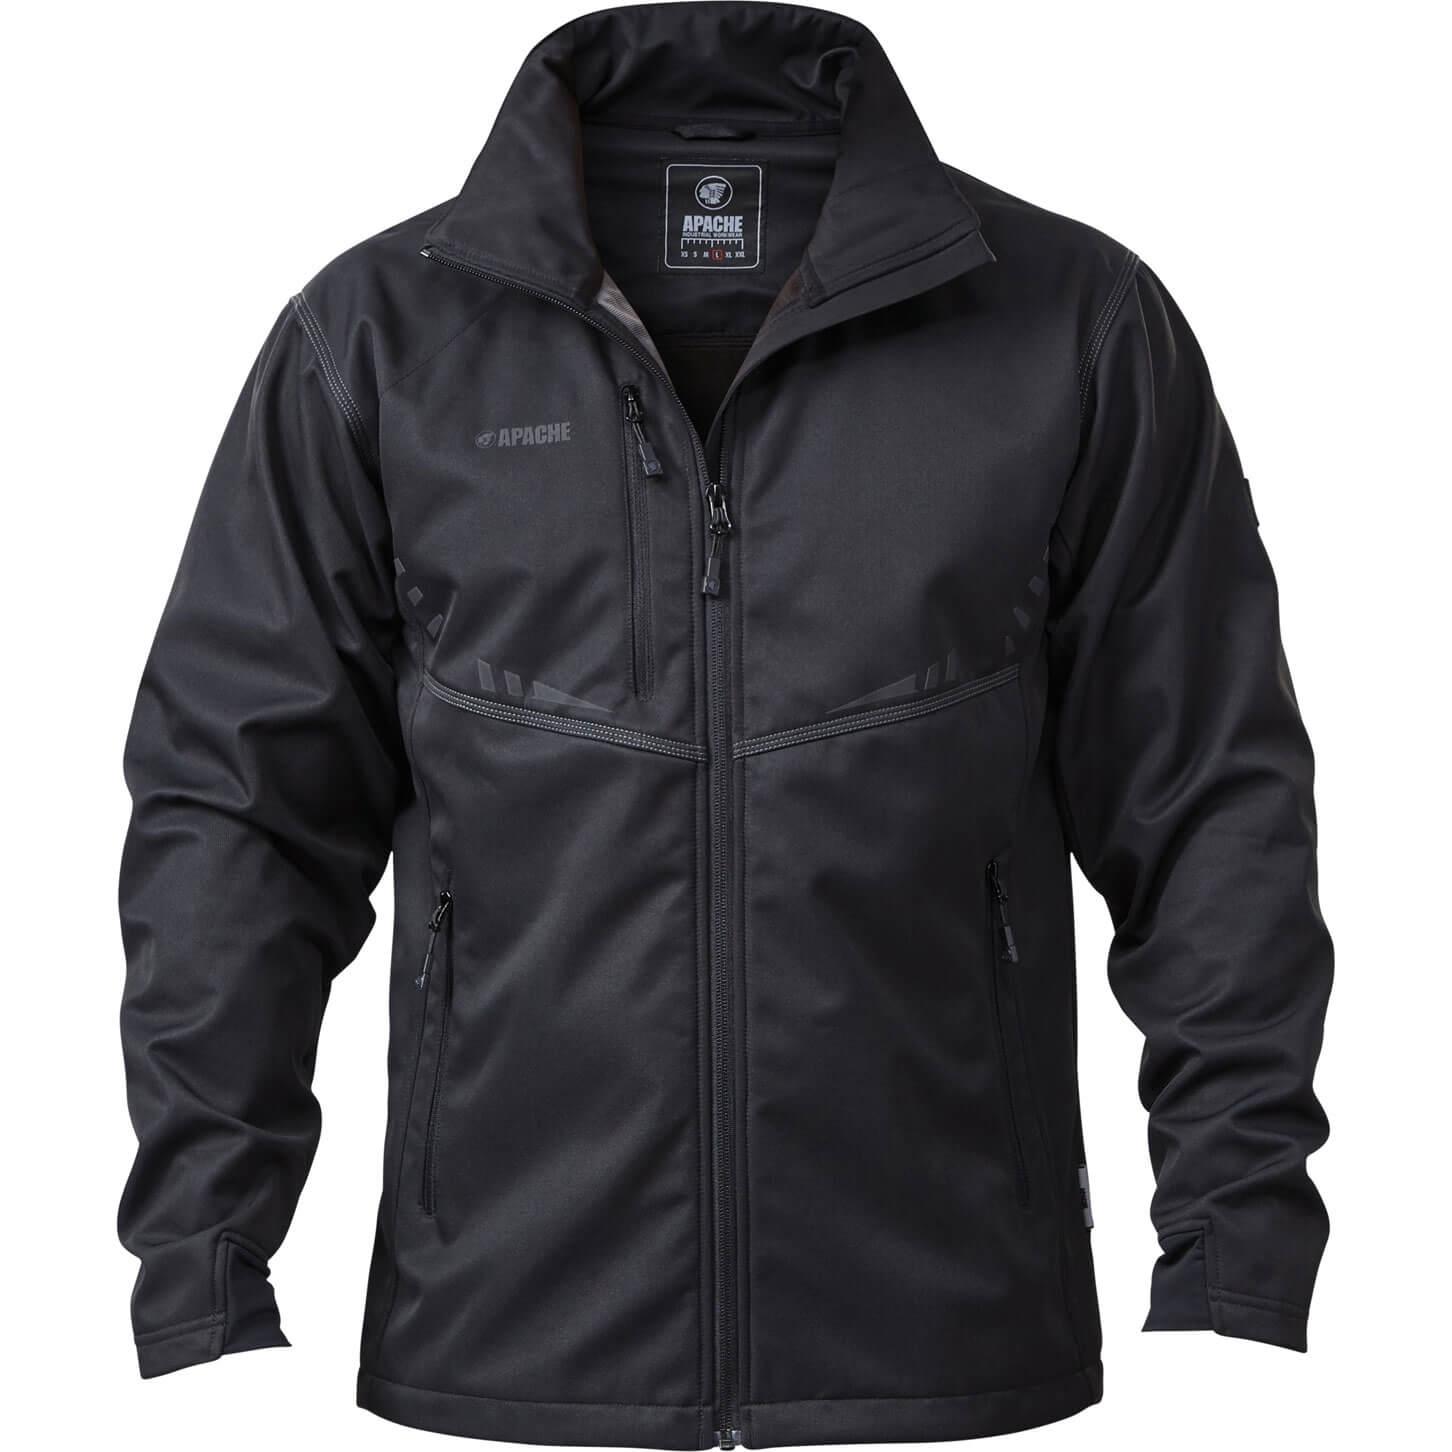 Image of Apache ATS Lightweight Soft Shell Jacket Black M